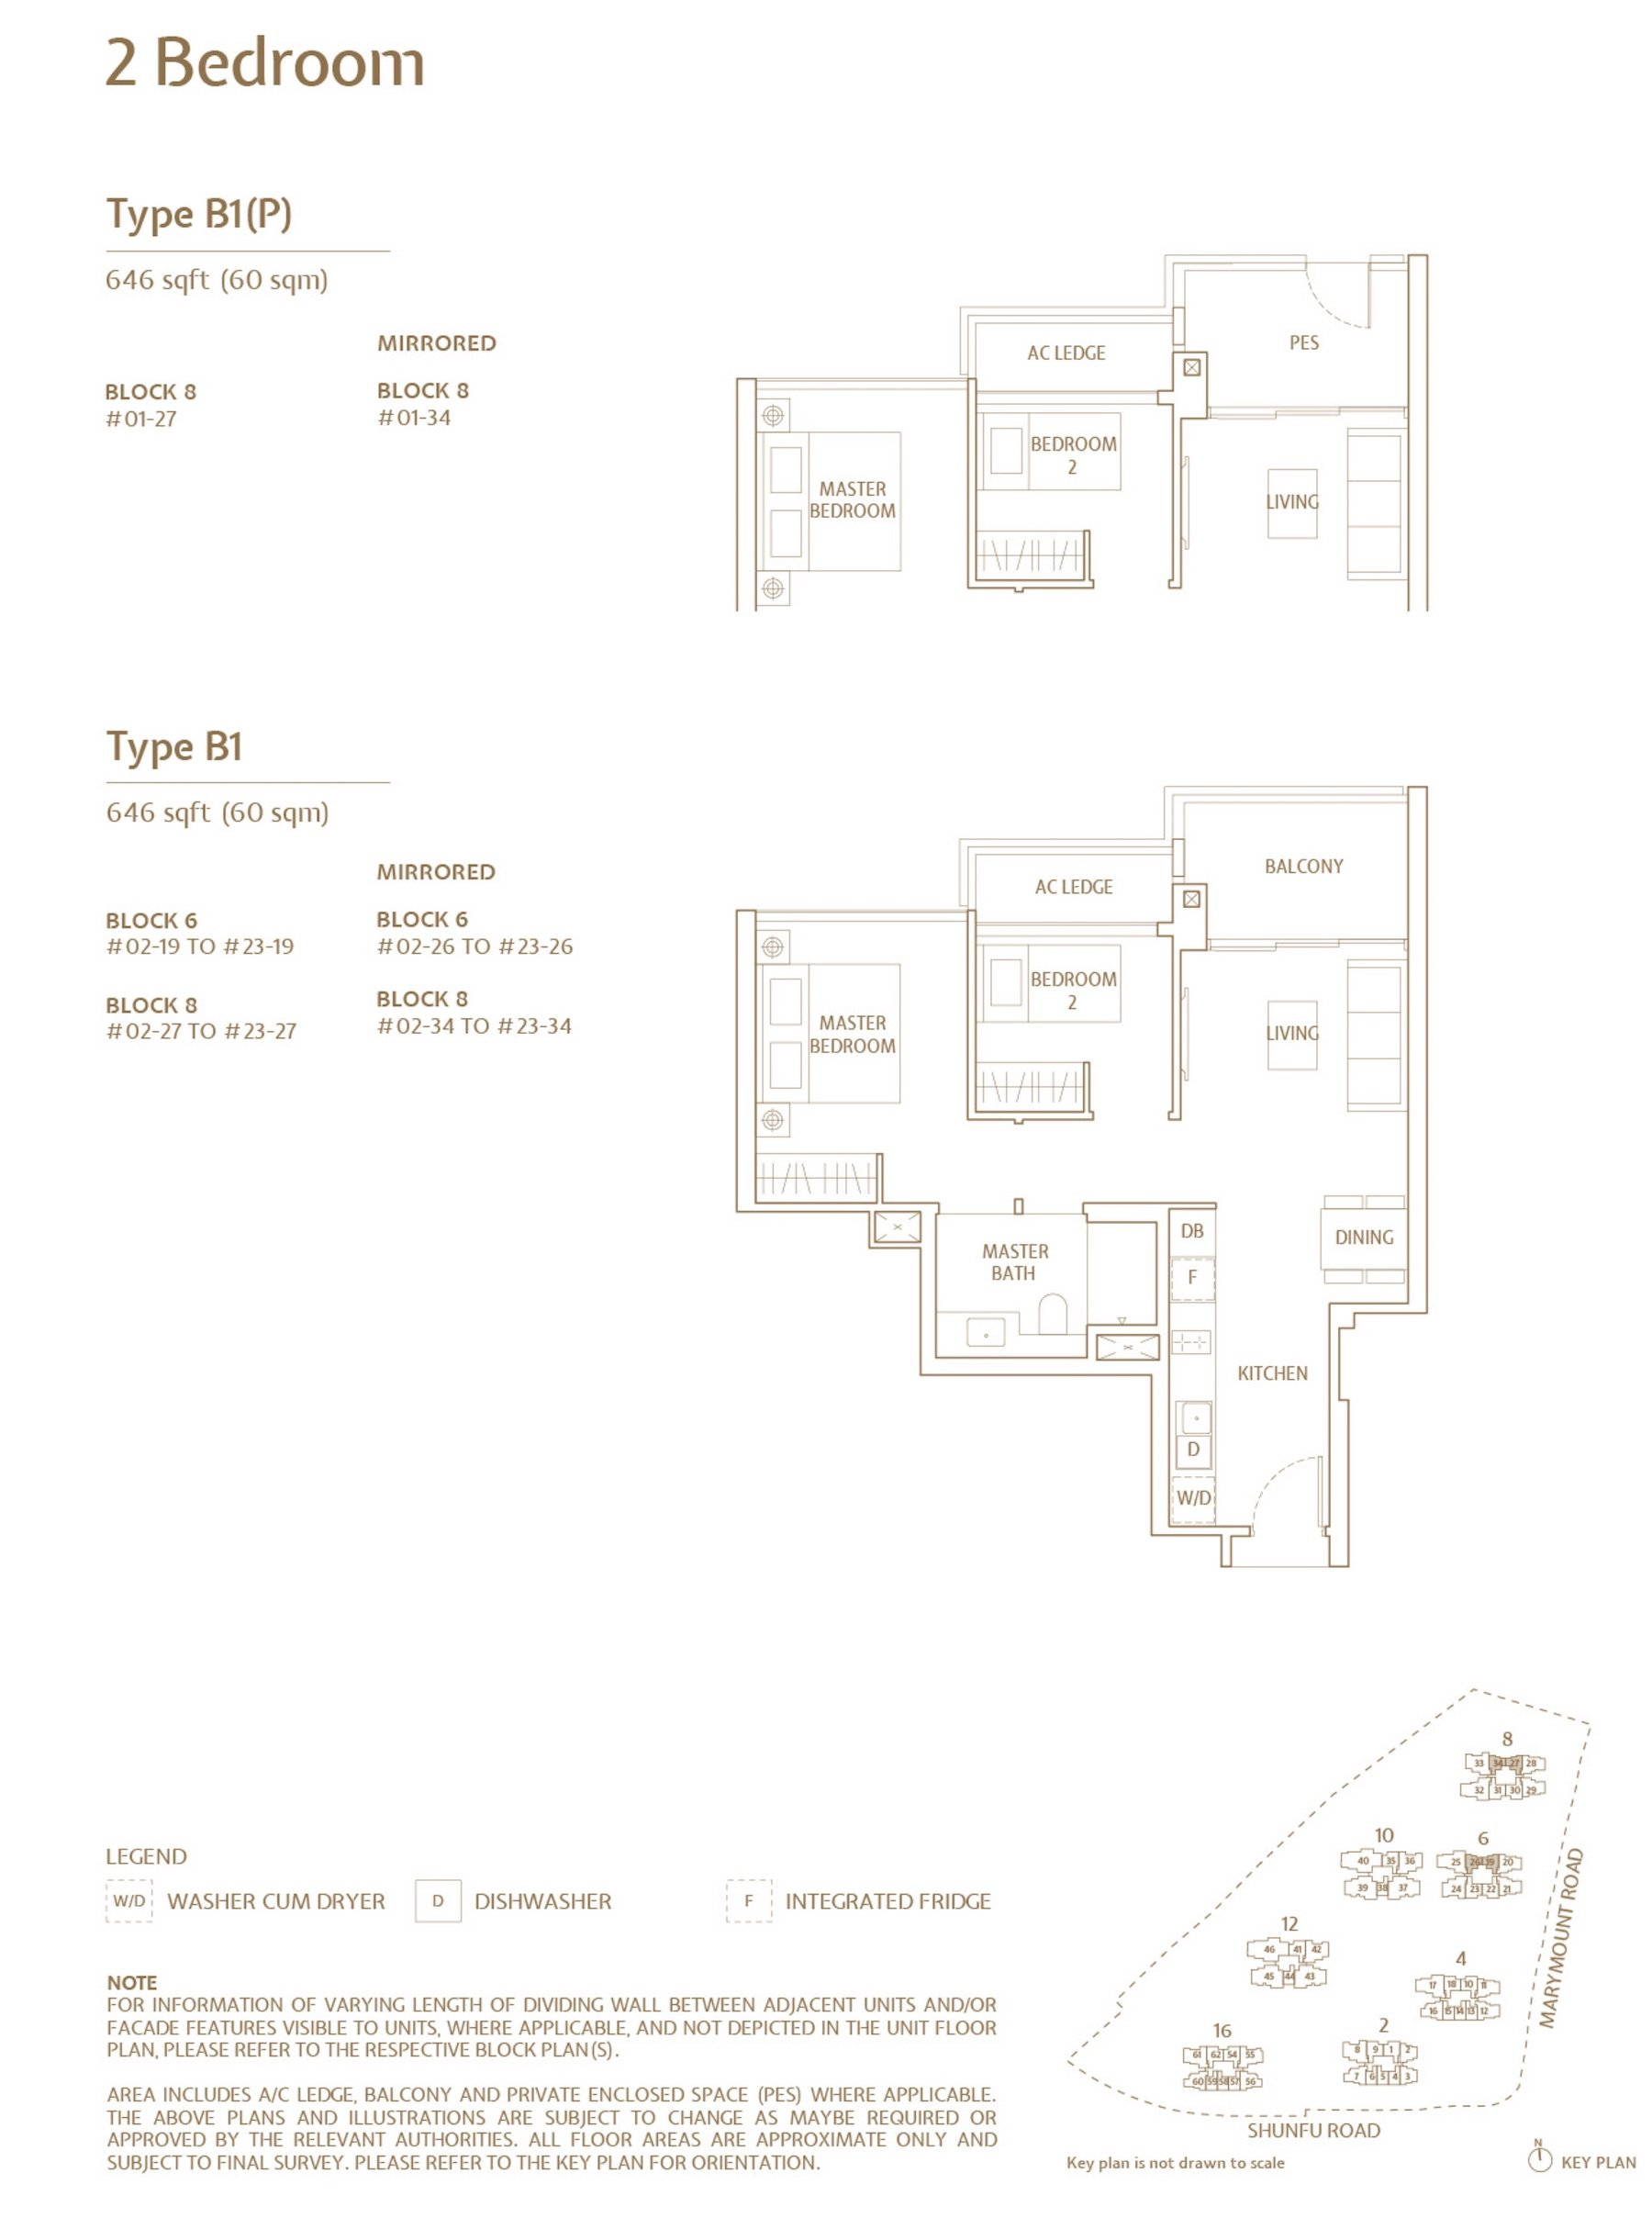 Jadescape 顺福轩 condo 2 bedroom type B1